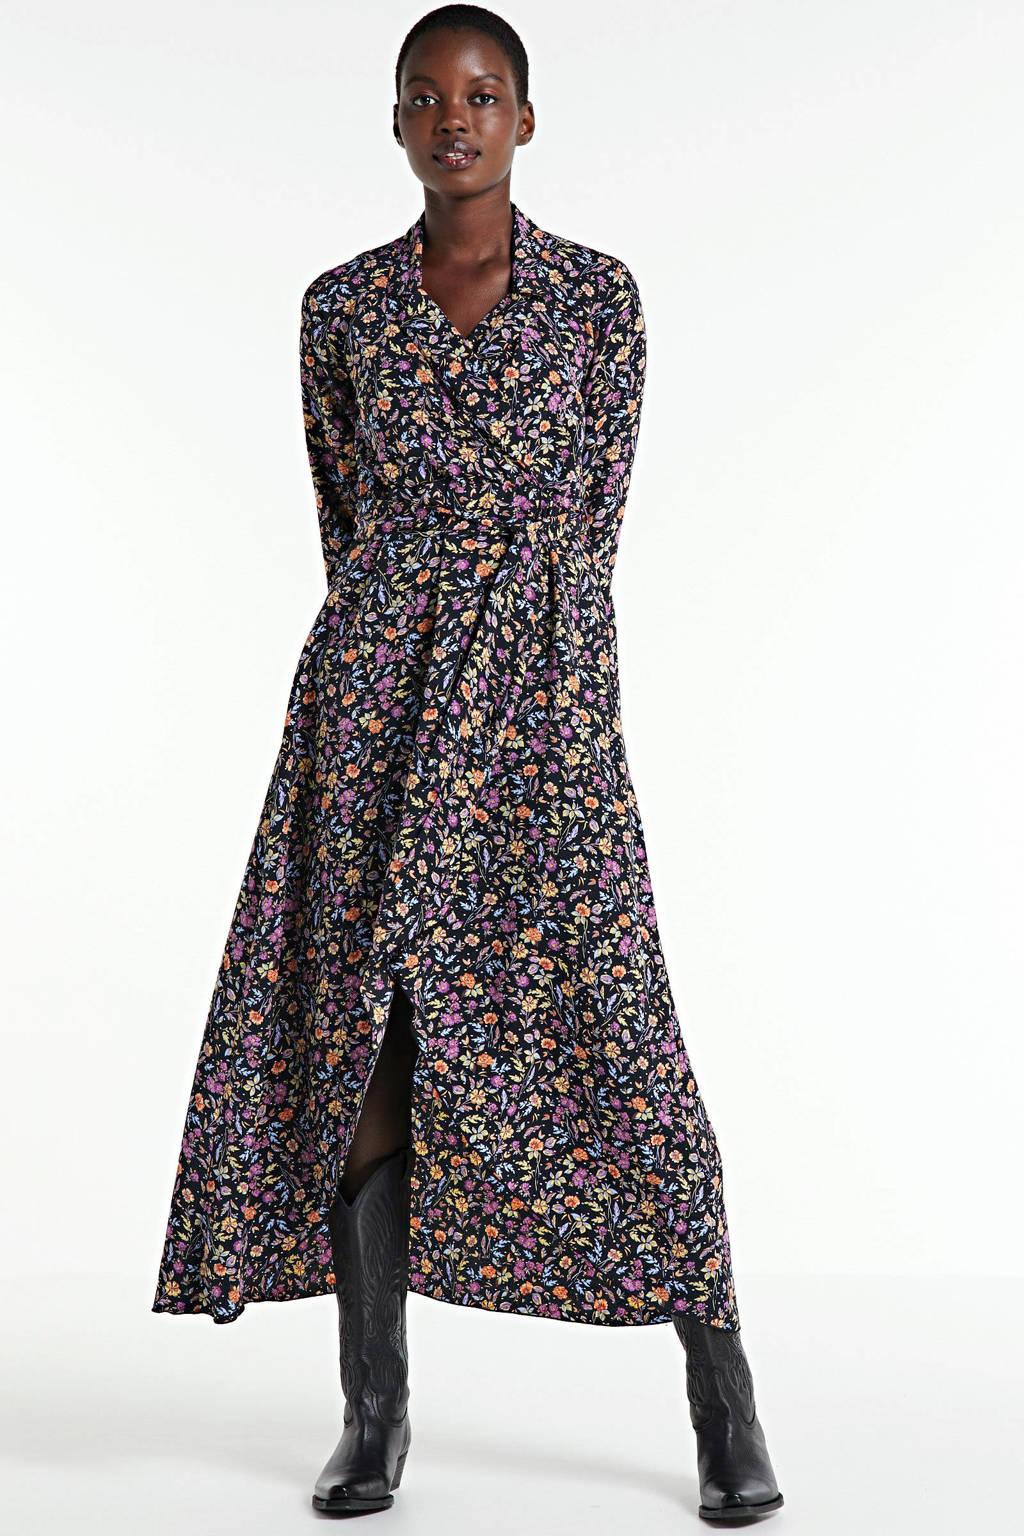 Colourful Rebel gebloemde wikkeljurk Vivian zwart/multi, Zwart/multi